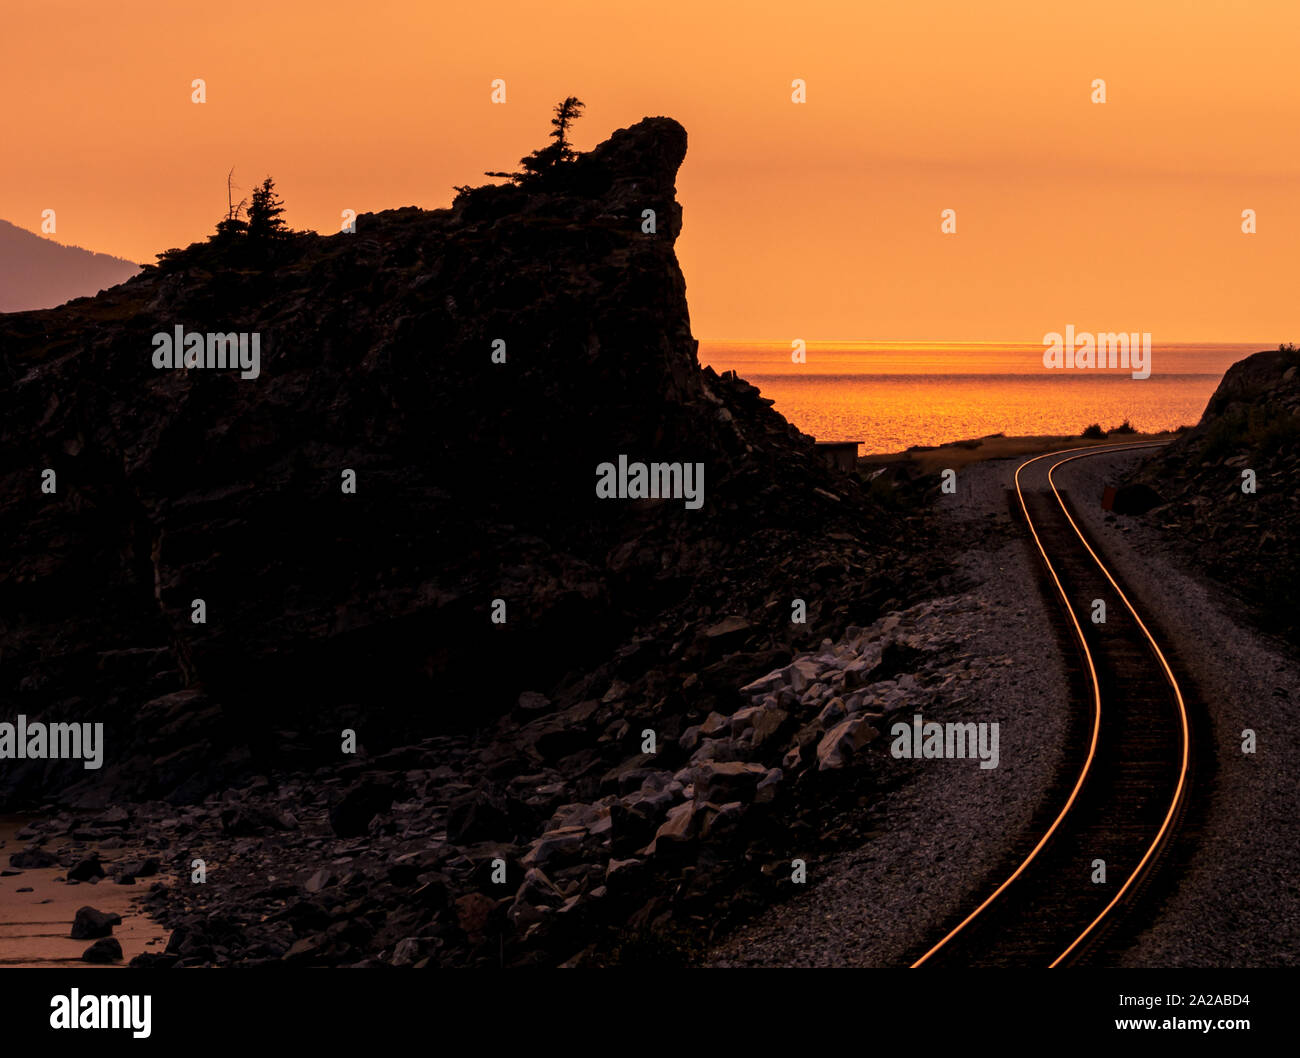 Railroad tracks on a beautiful rocky coastline with sunset and steel tracks glowing orange and yellow. Turnagin Arm, Seward Highway, Alaska. Stock Photo